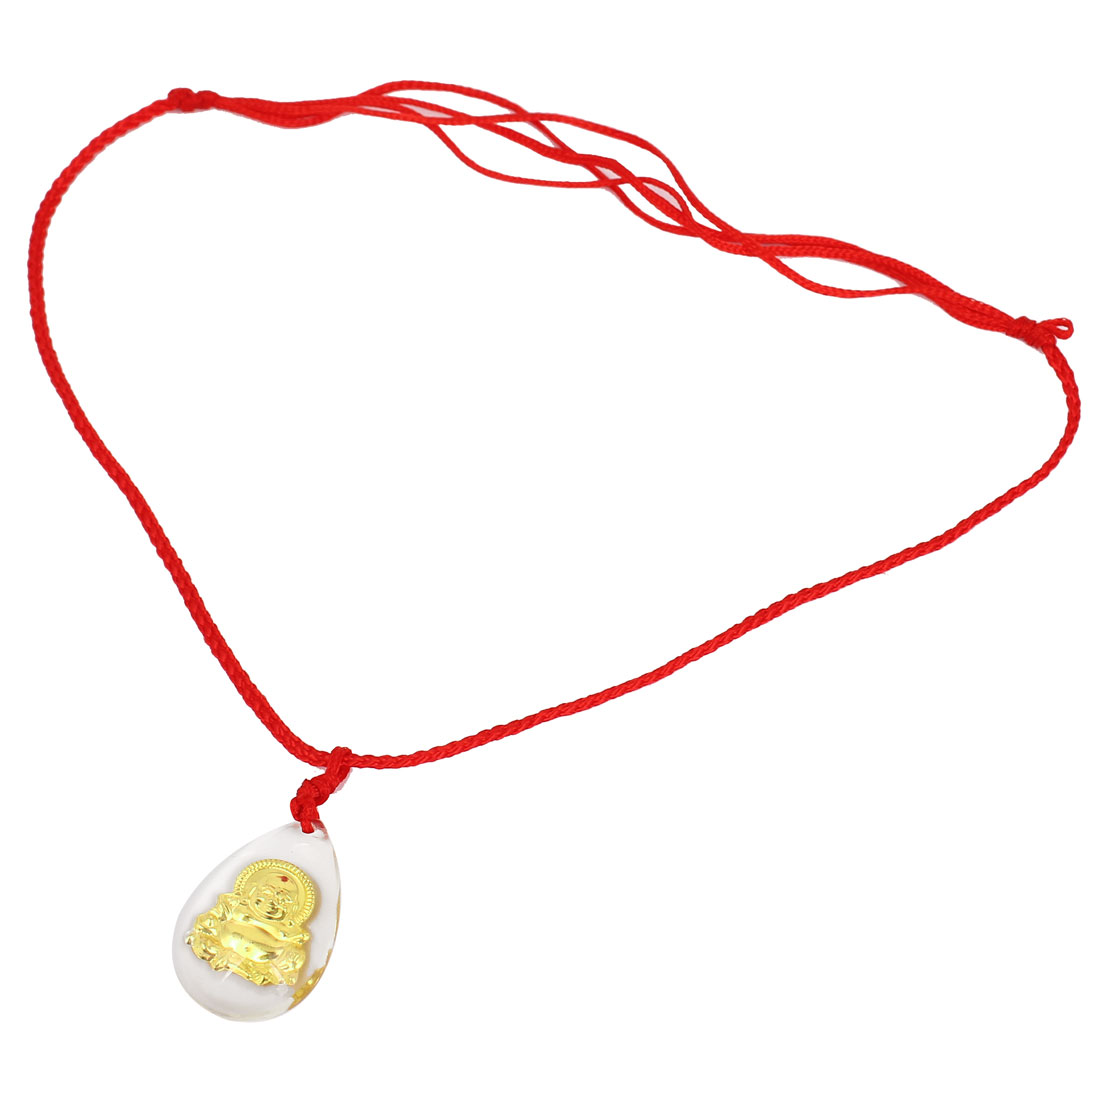 Red Handmade Adjustable Nylon Braided Rope Plastic Gold Tone Buddha Pendant Necklace